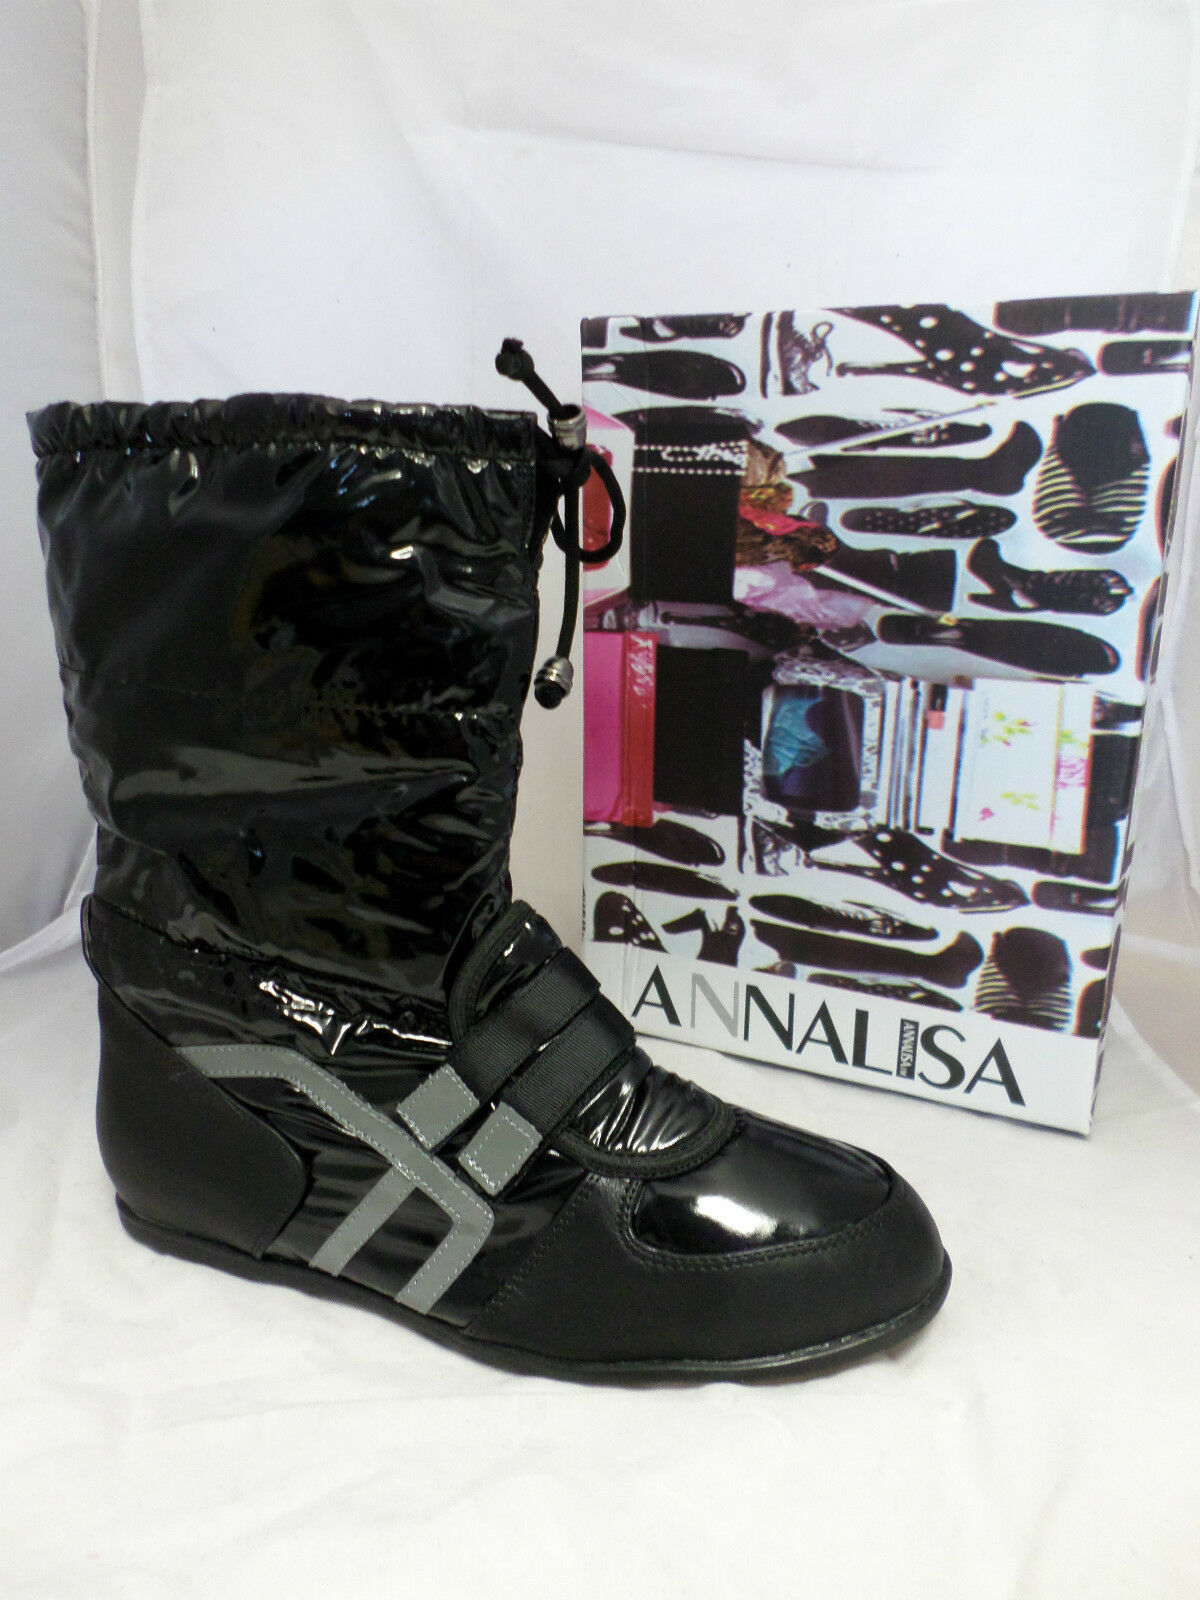 Annalisa J.M Black Patent Sport Style Boots All Sizes EM15 75 SALEw